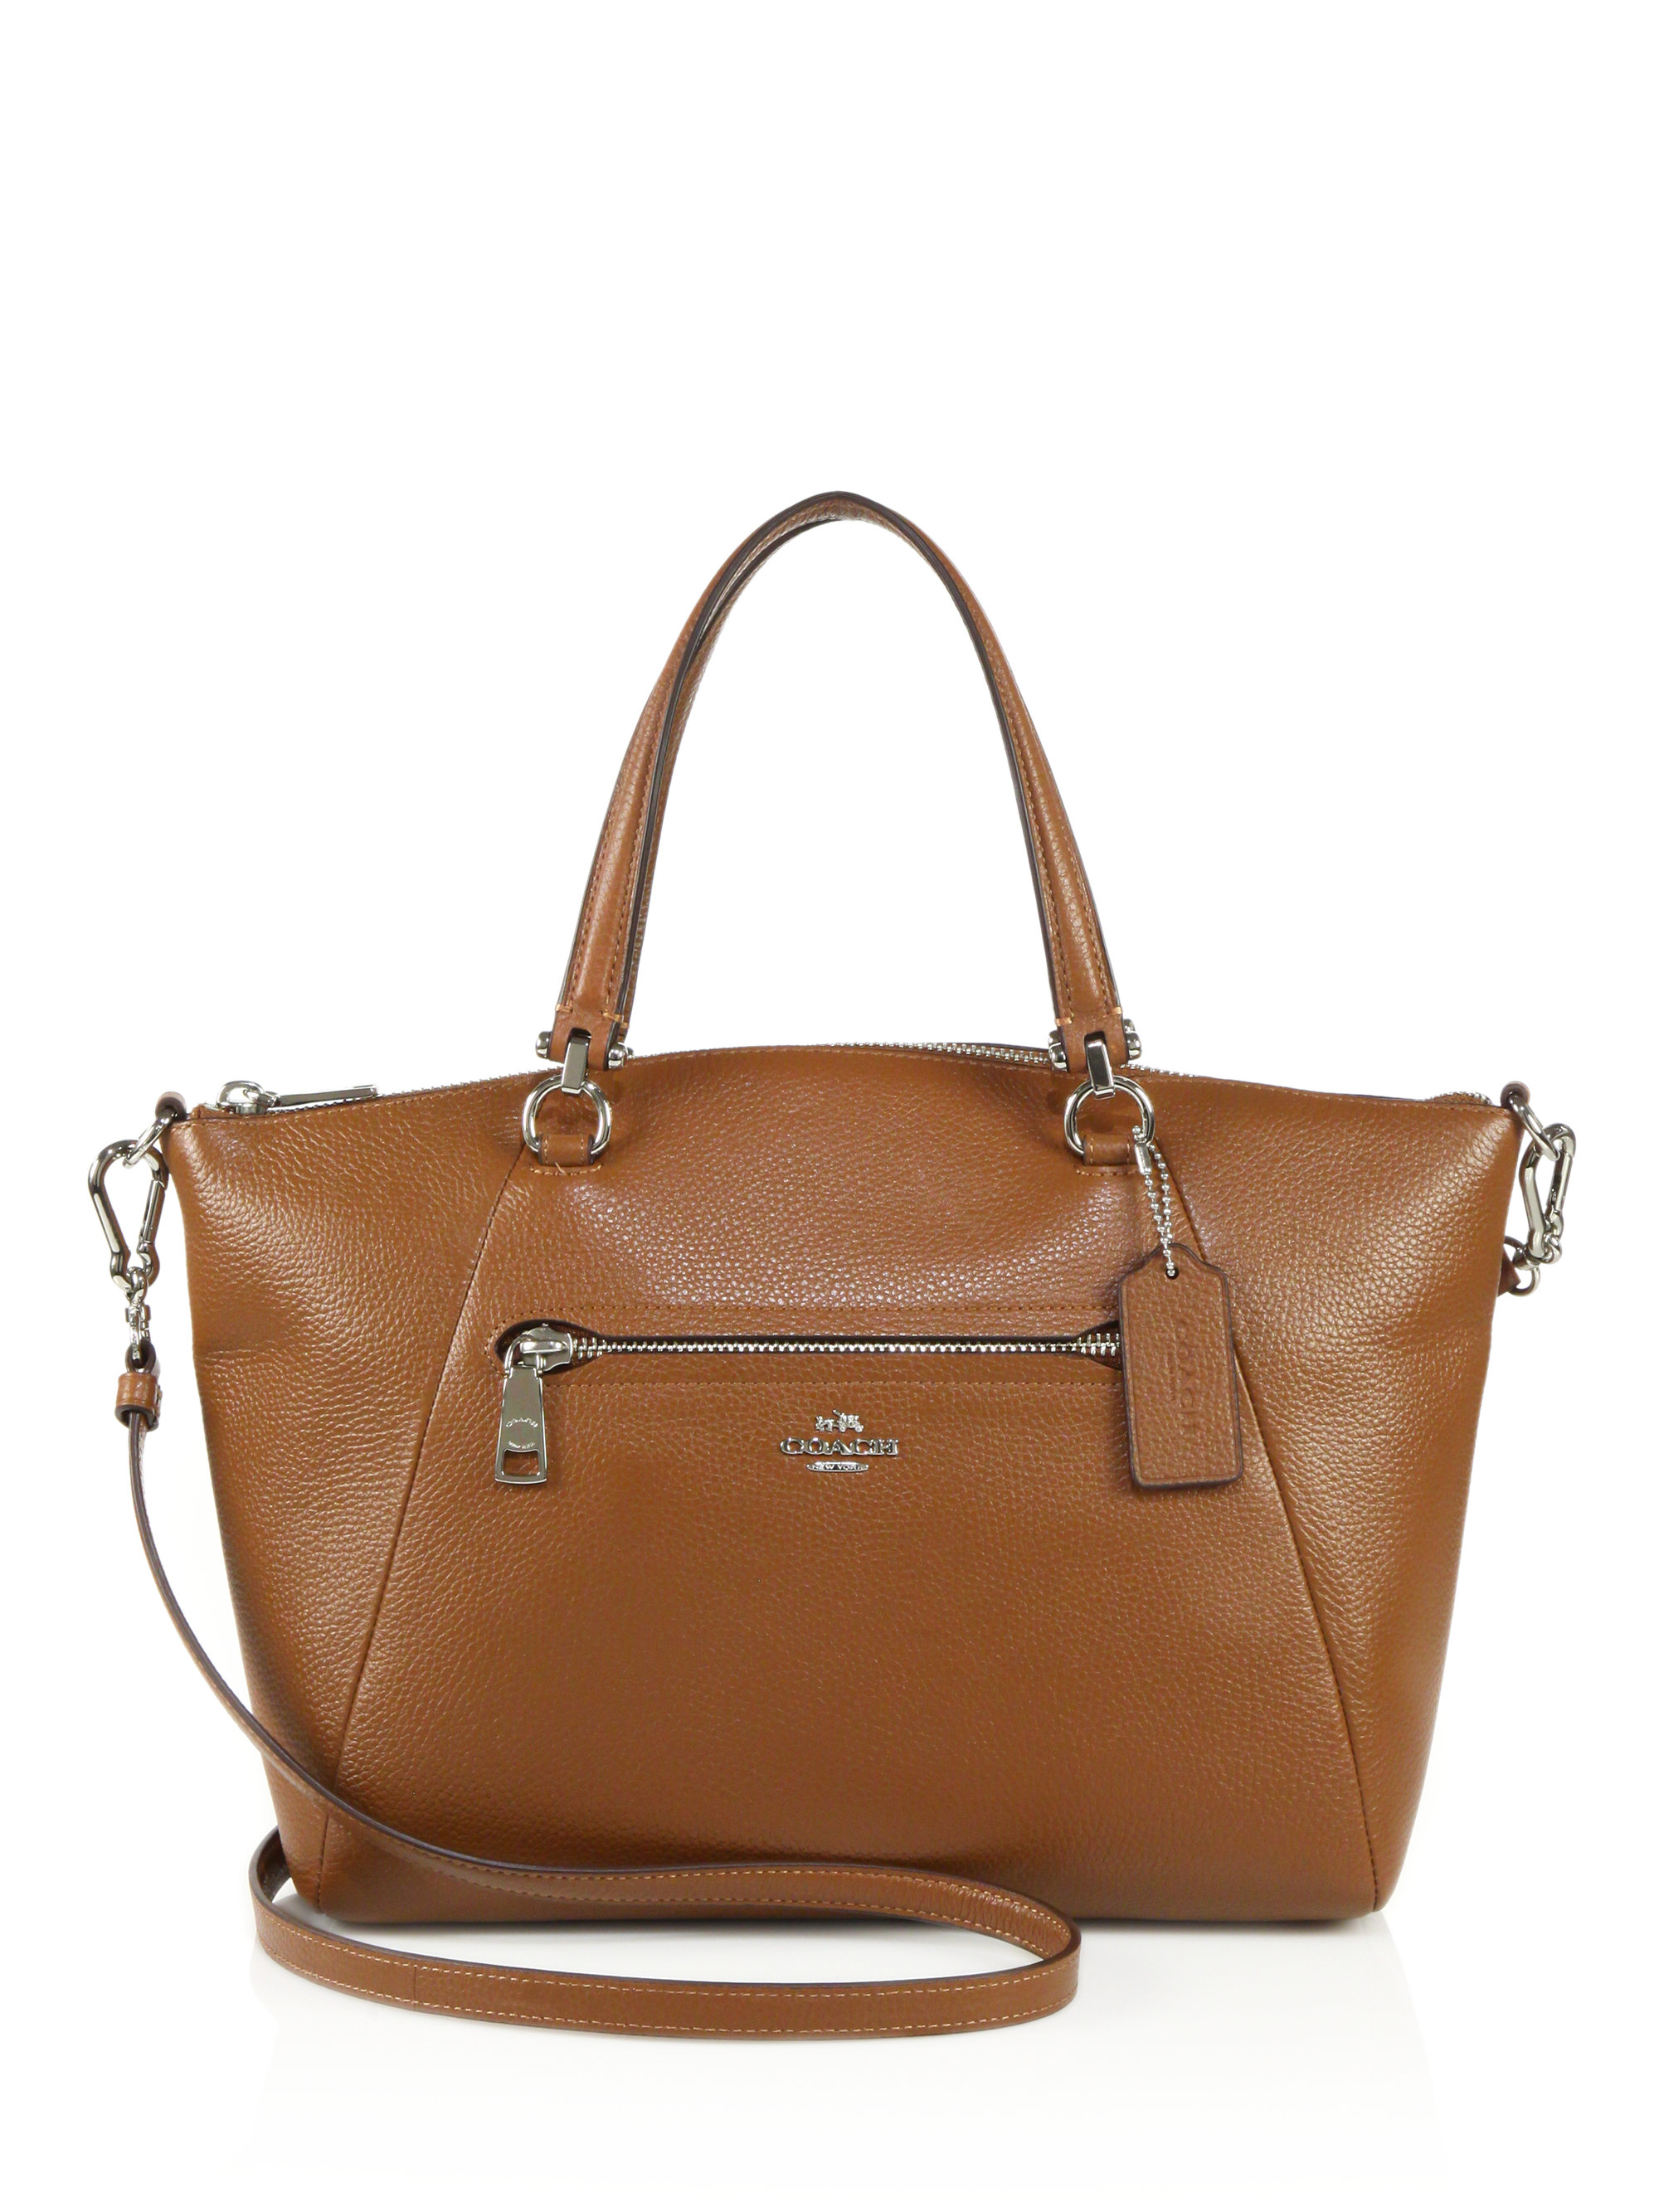 celine luggage mini bag price - C��line Pre-owned Beige Pebbled Leather Mini Luggage Tote Bag in ...